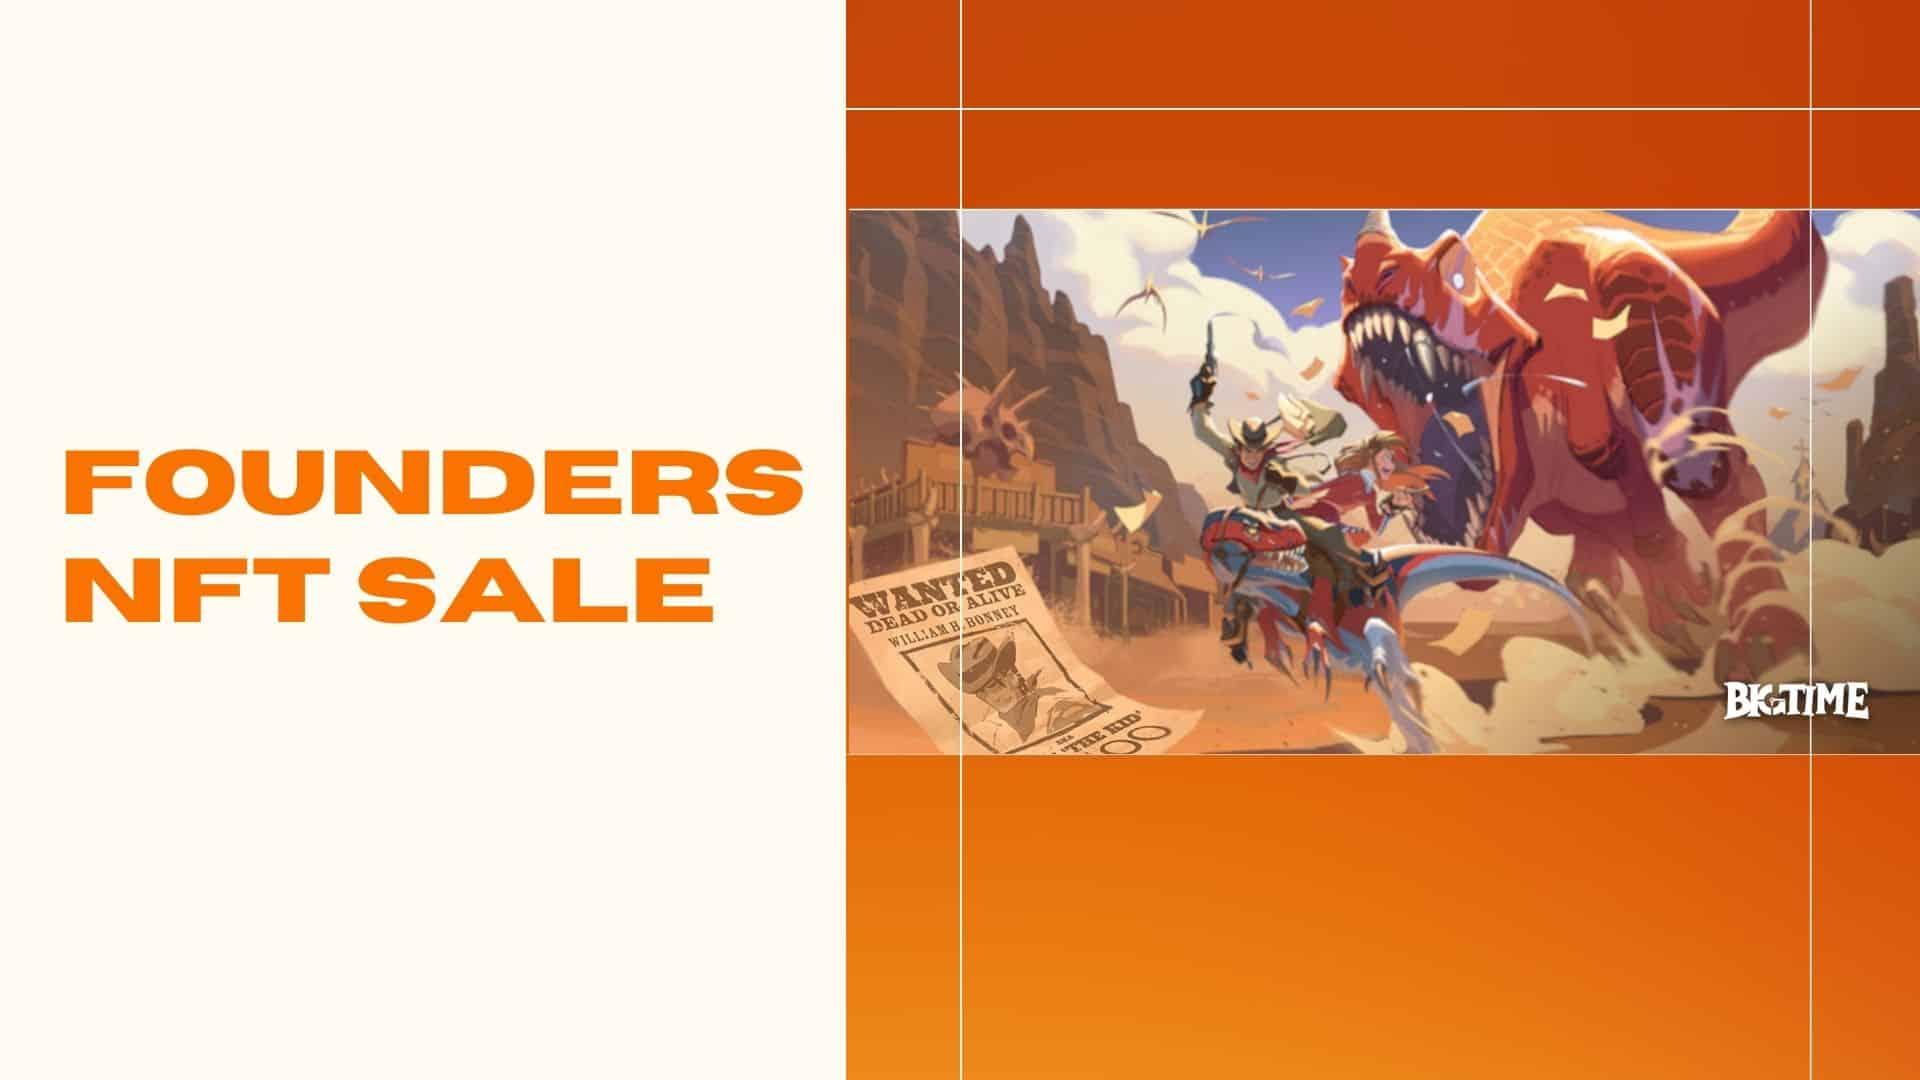 Big Time Founder's NFT Sale on July 19